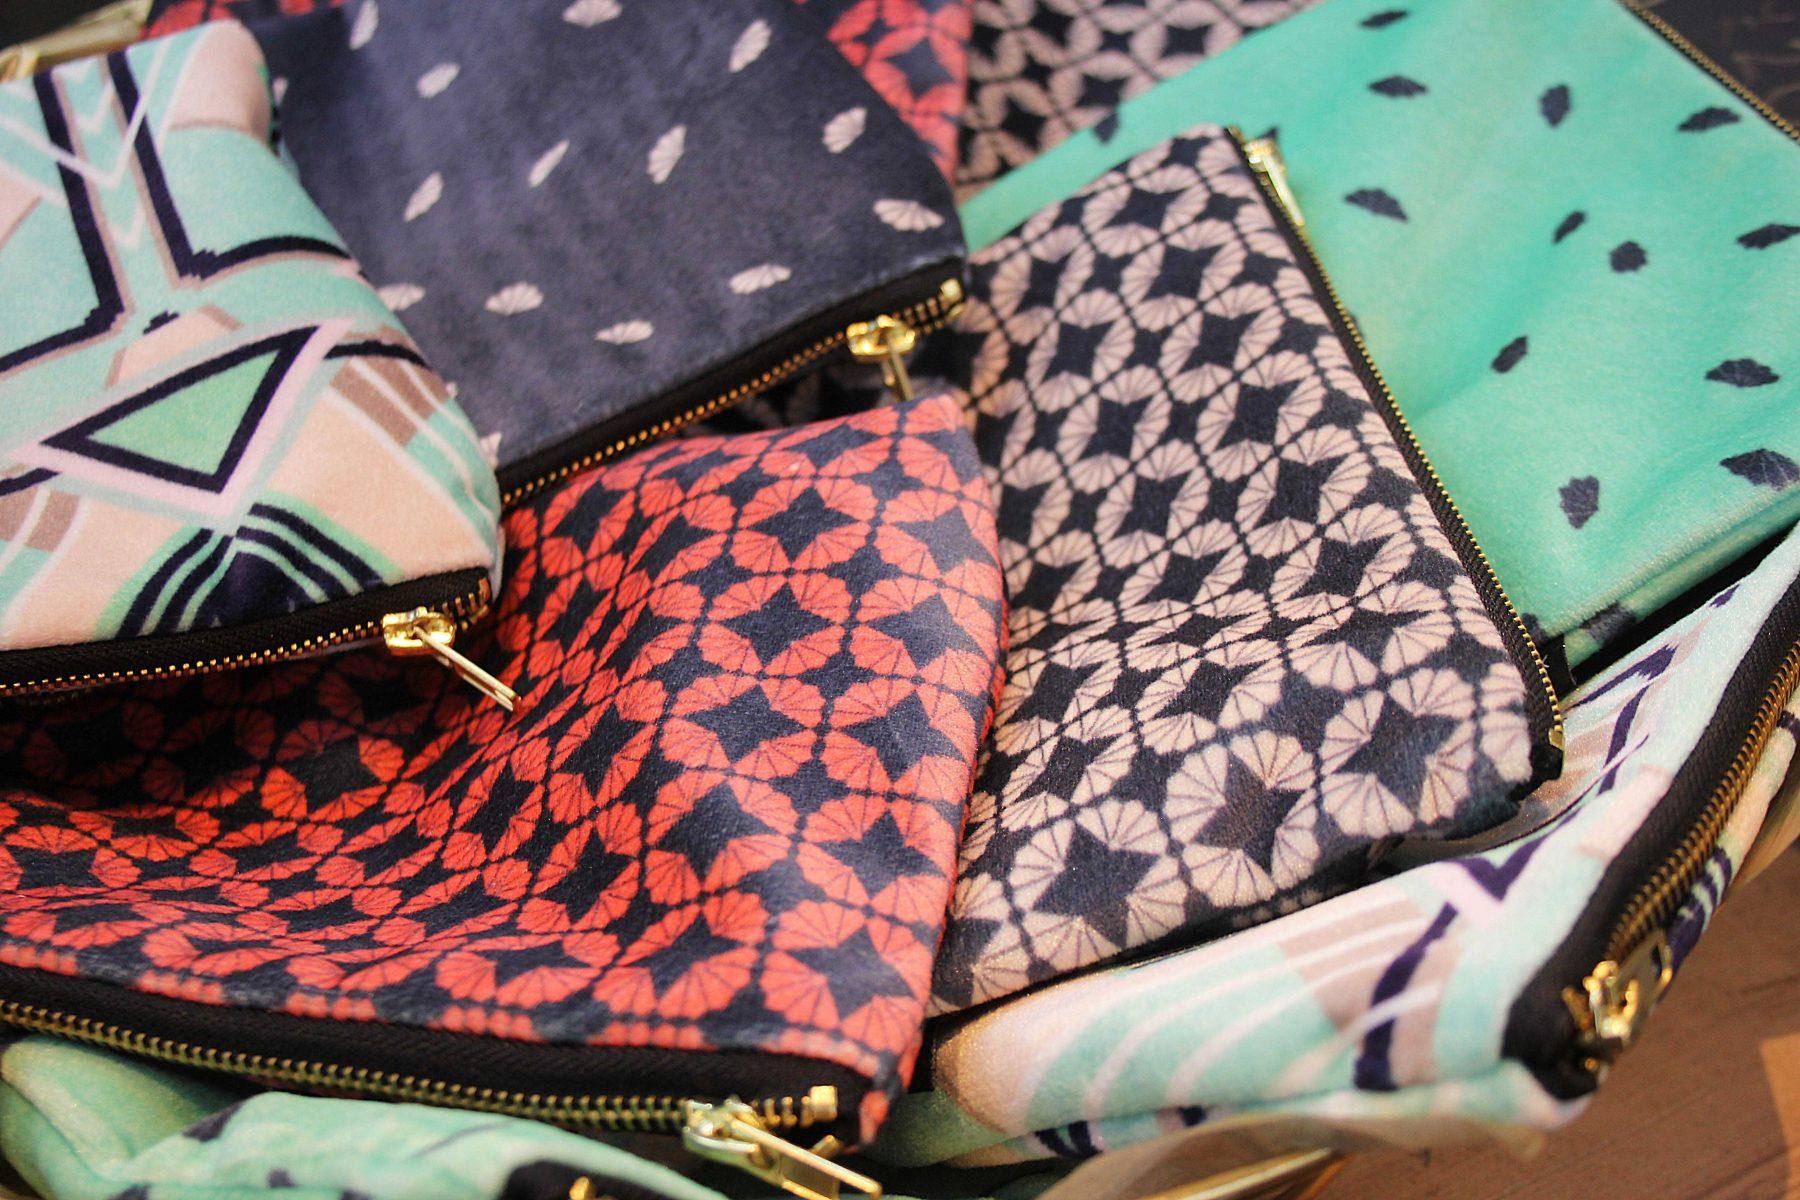 Meet the Maker – Cinda Clark Design